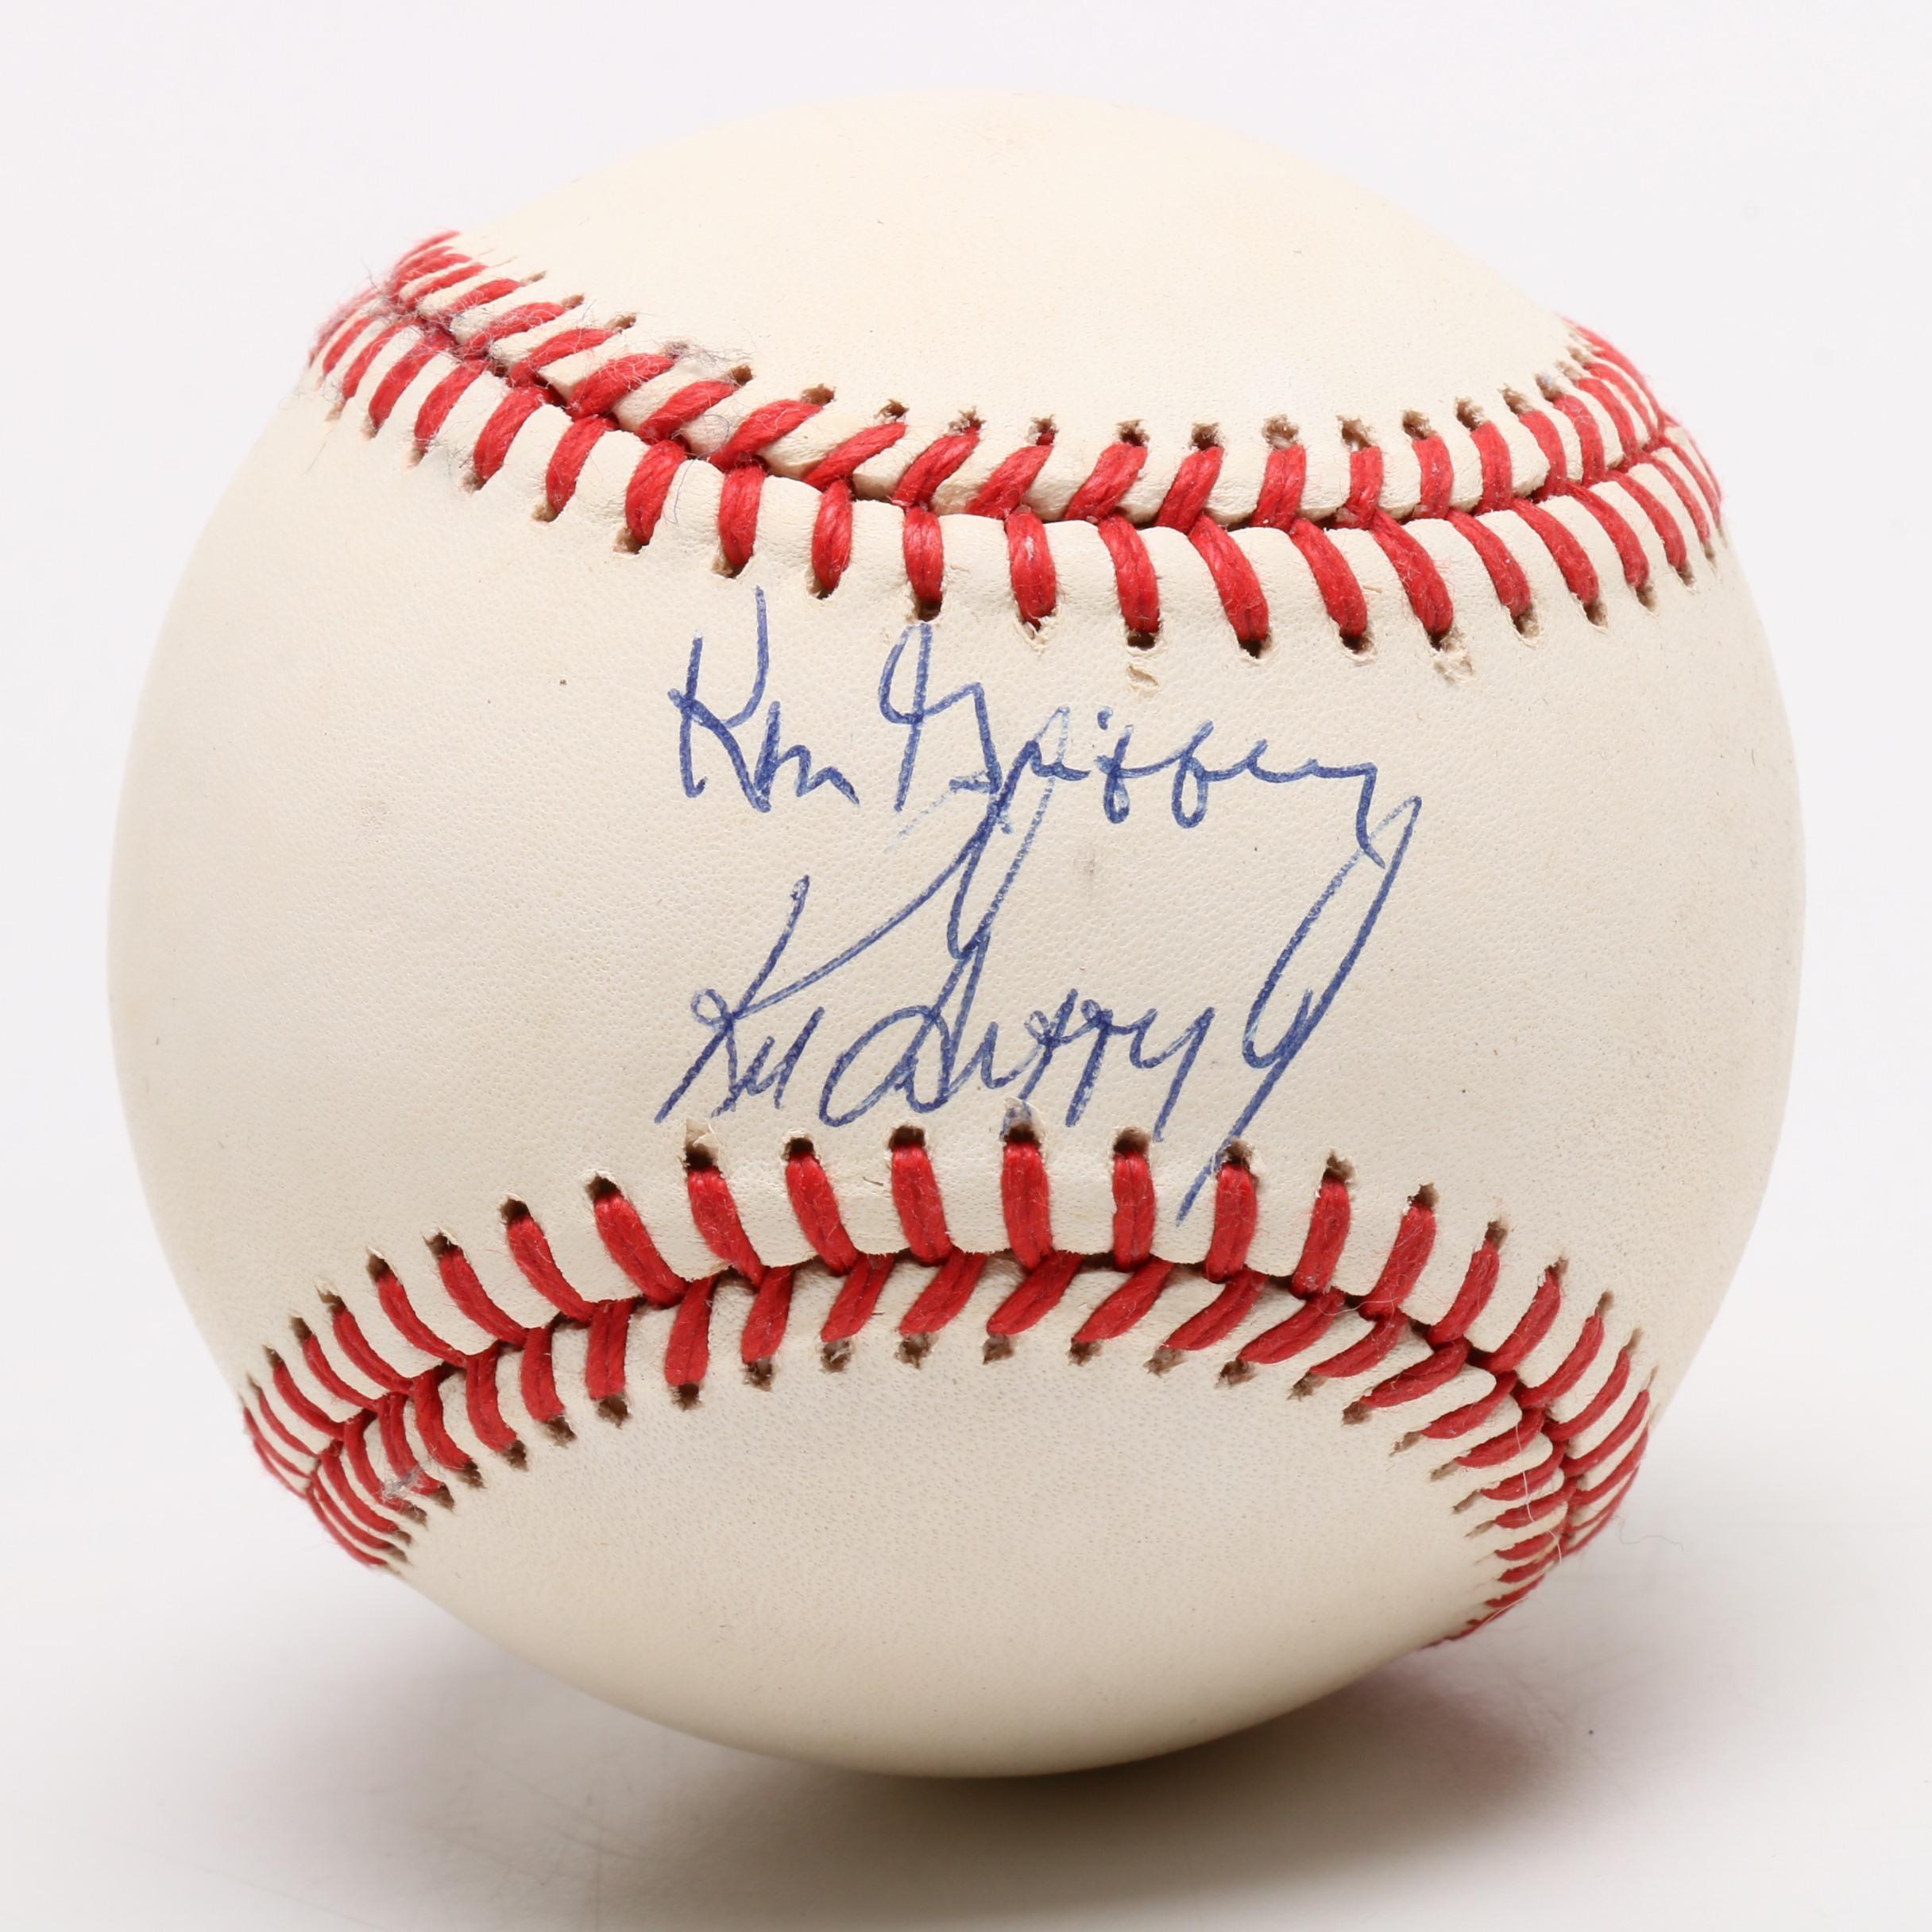 Ken Griffey Sr. and Jr. Signed American League Baseball